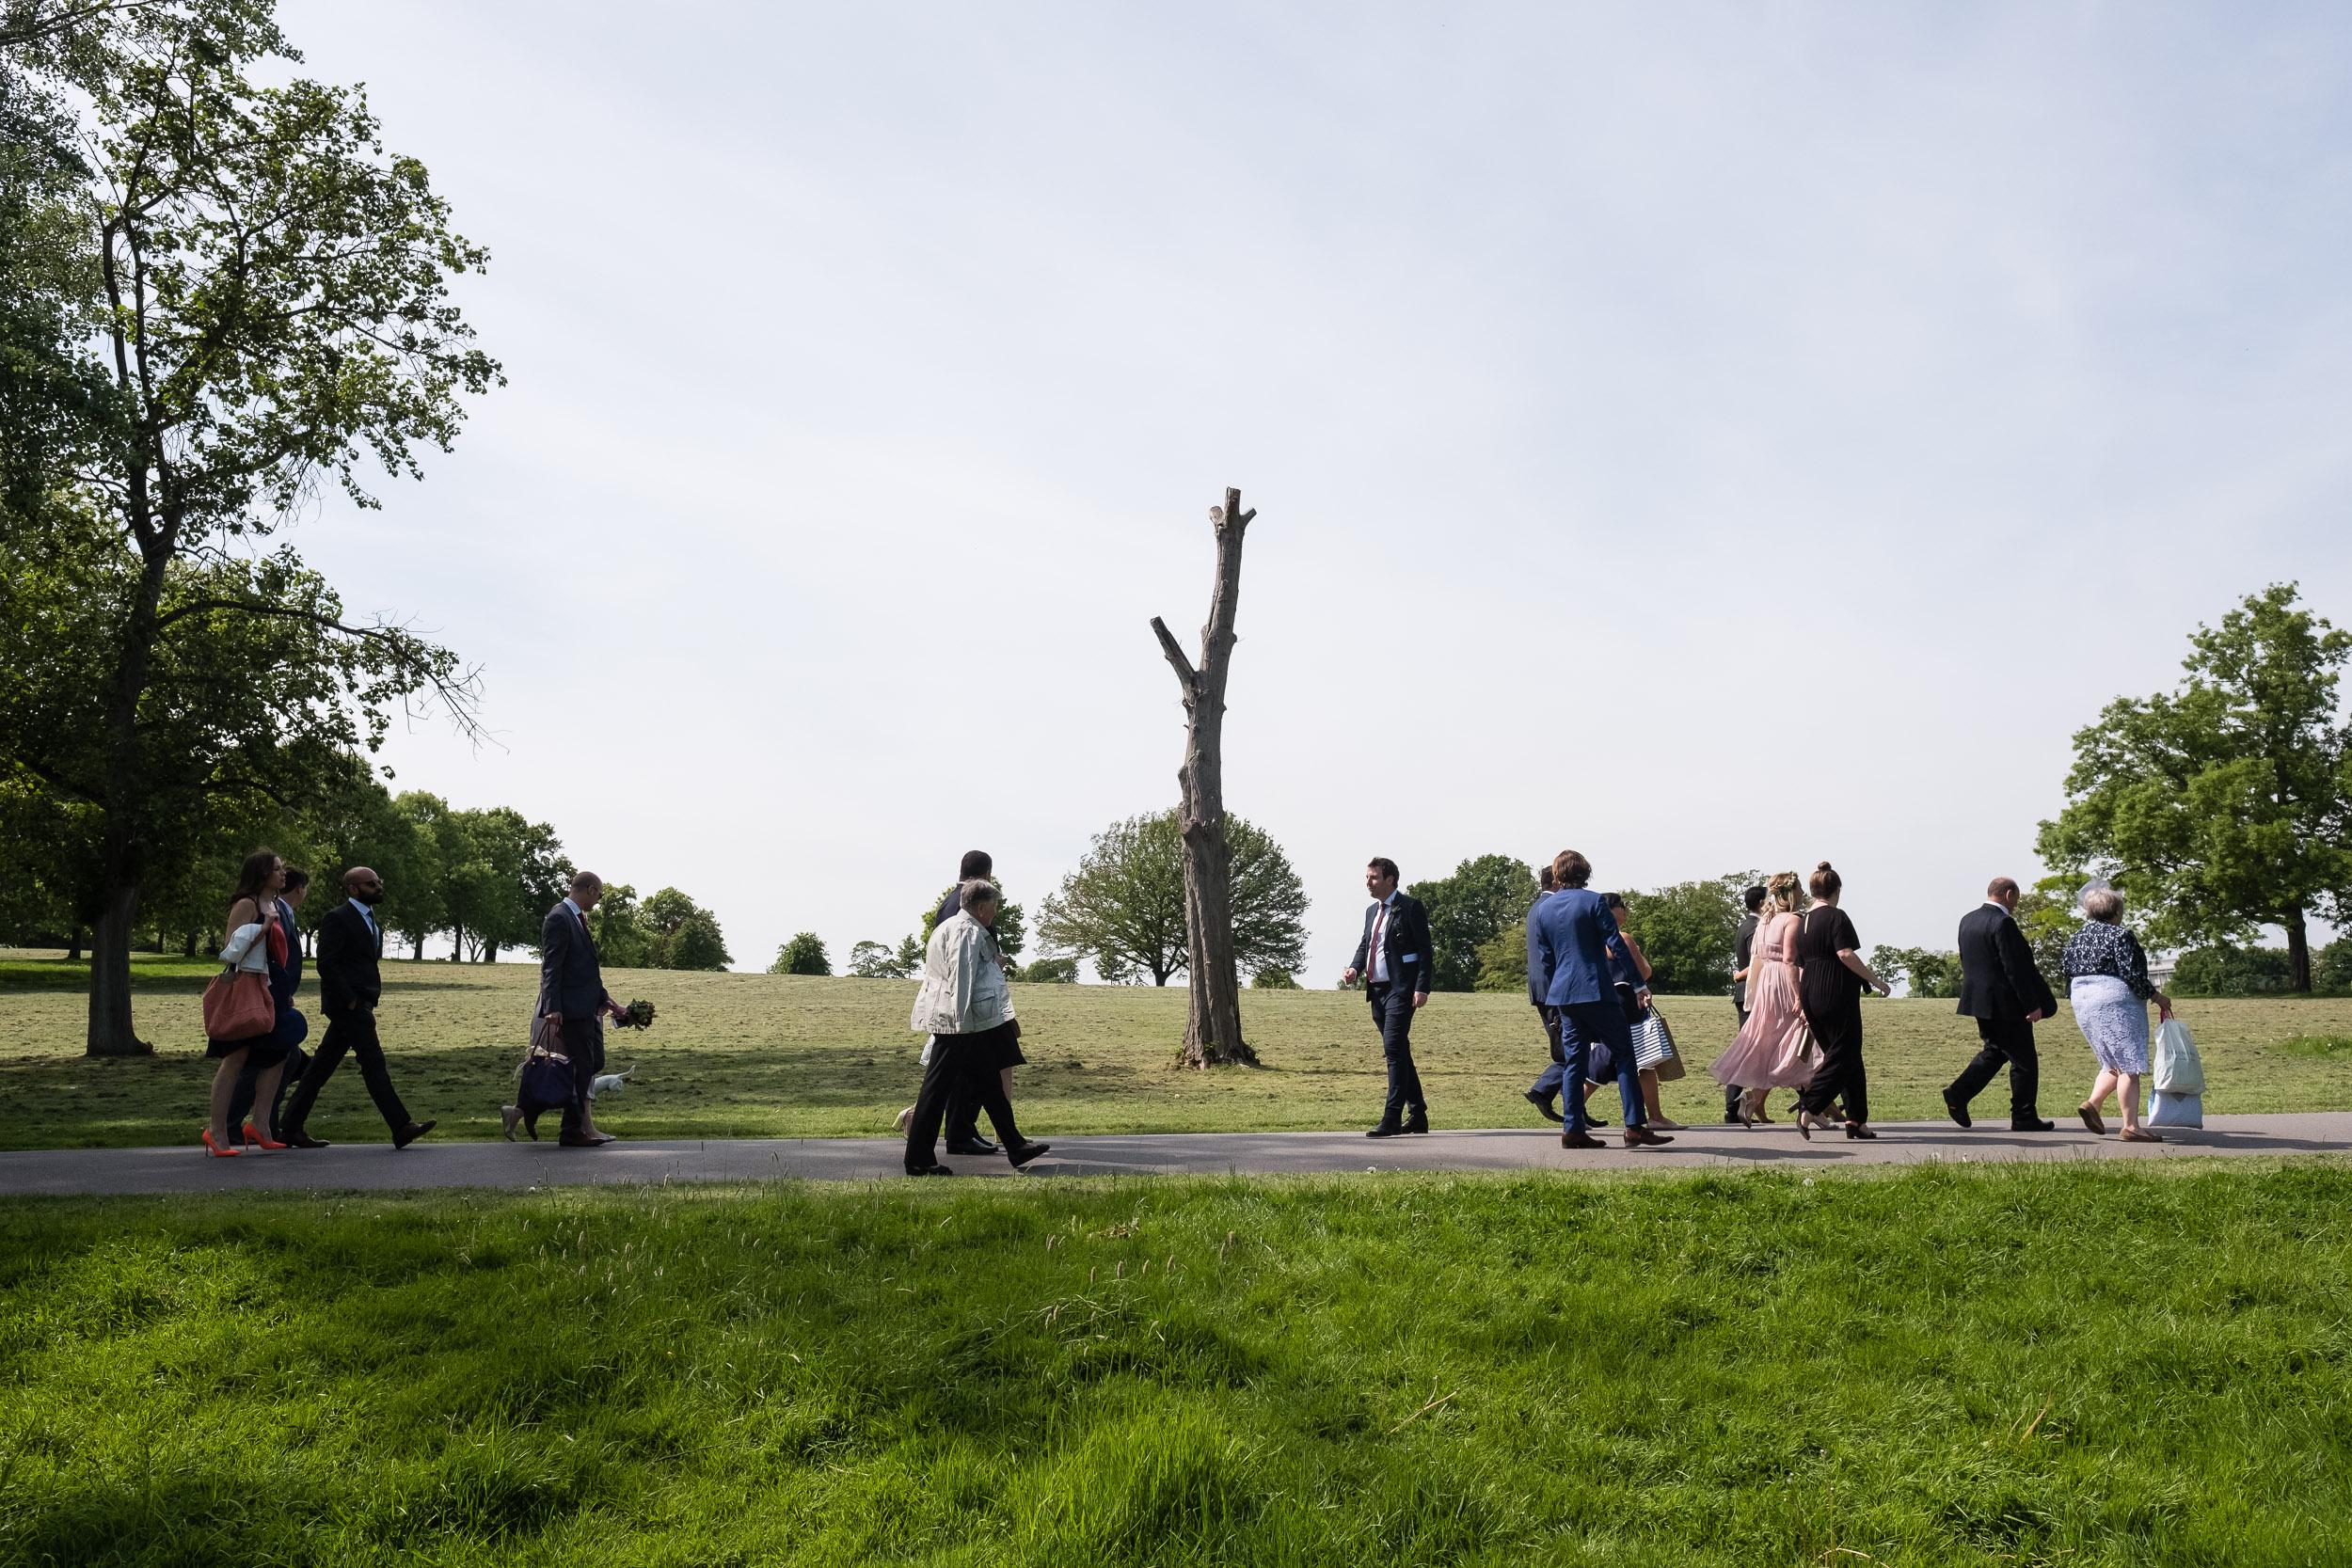 brockwell-lido-brixton-herne-hill-wedding-100.jpg